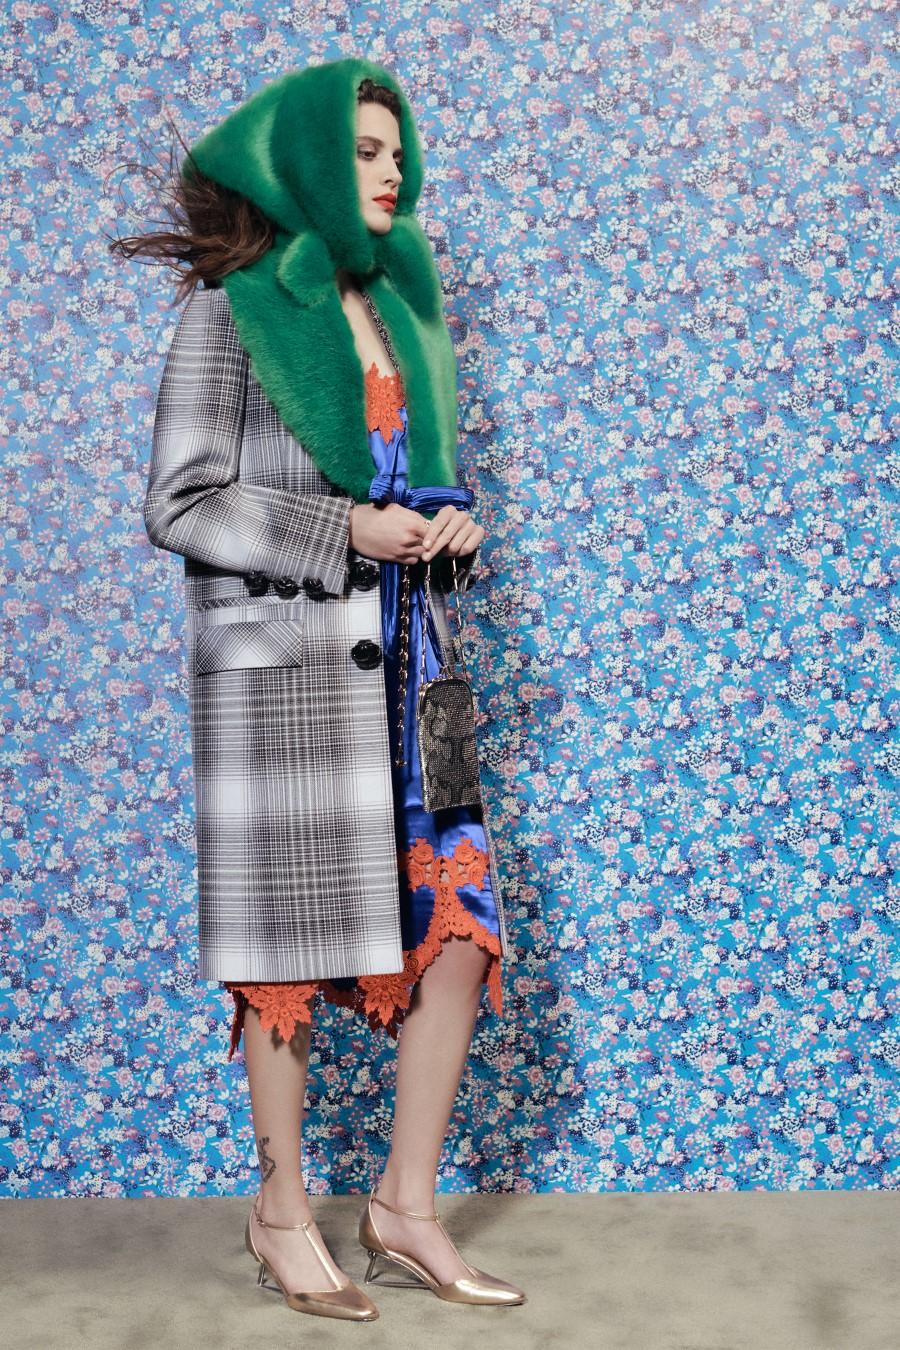 Paco Rabanne Fall Winter 2021 - Paris Fashion Week